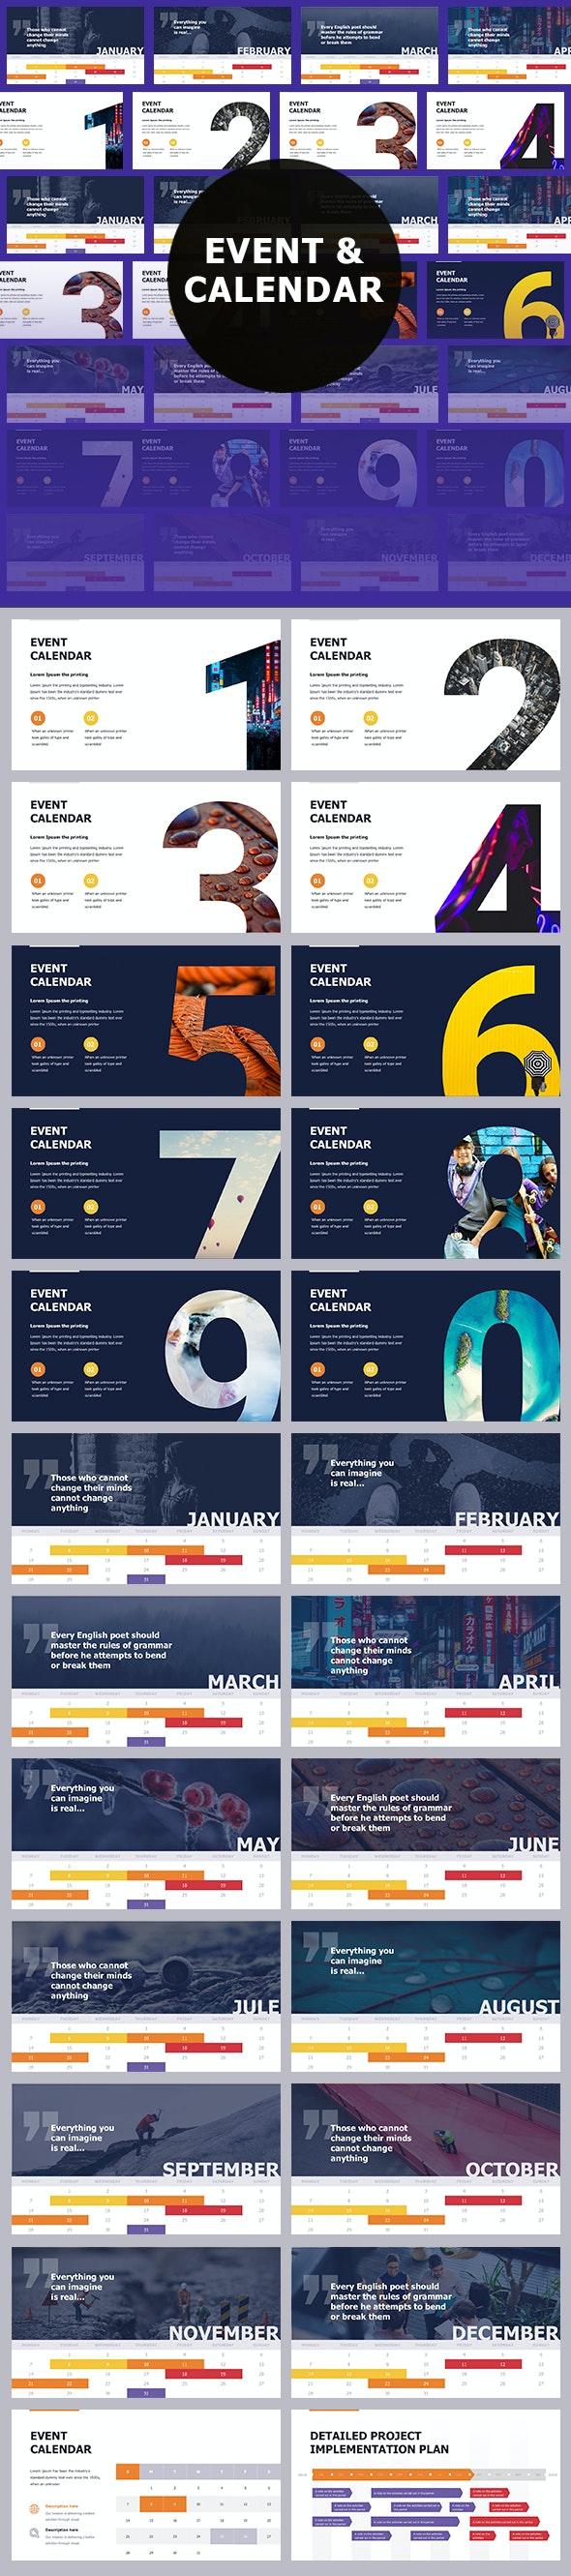 Event & Calendar Powerpoint Themes - Creative PowerPoint Templates